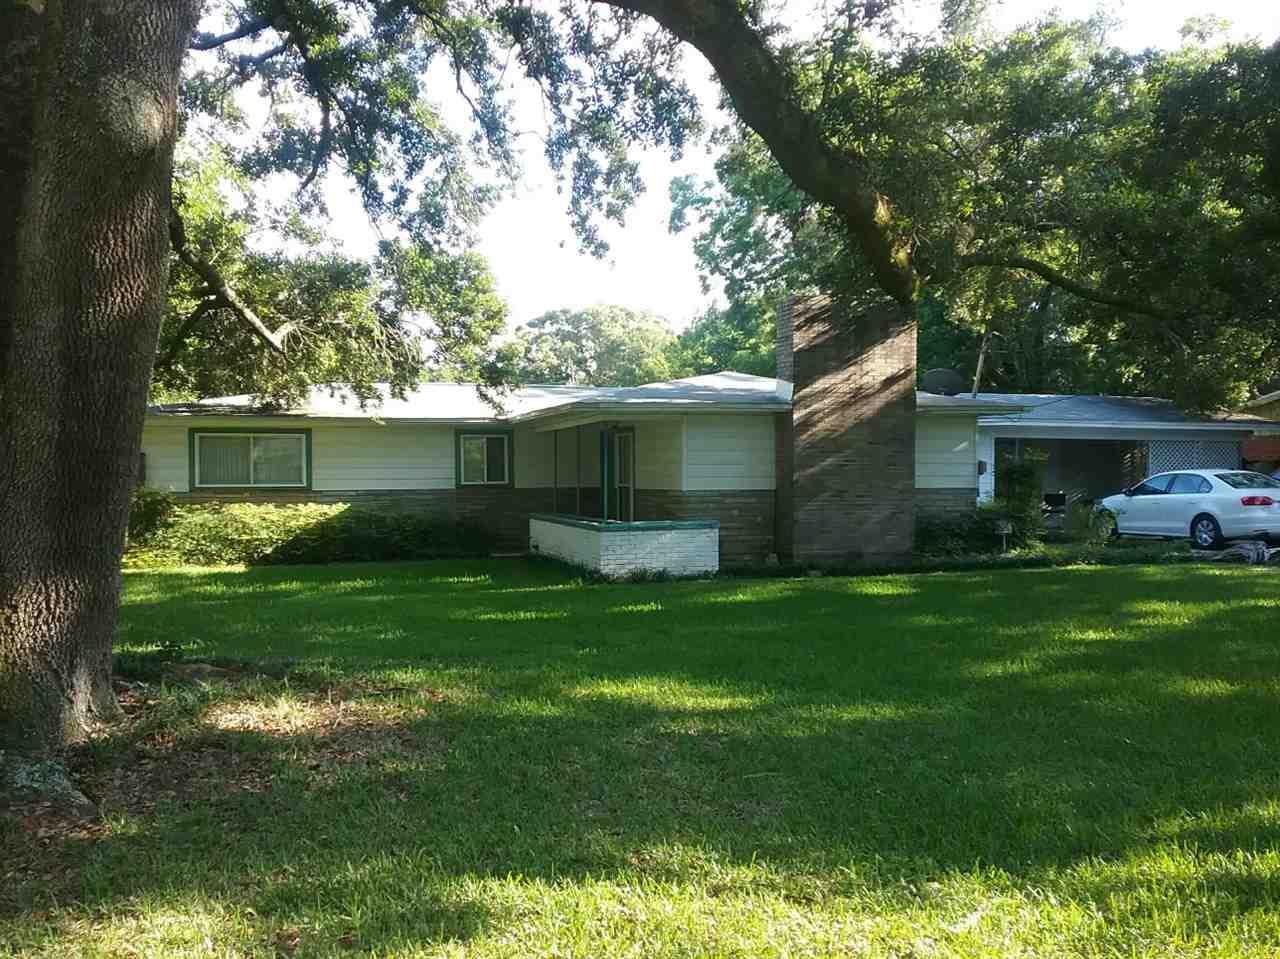 209 Etta St, Pensacola, FL 32514